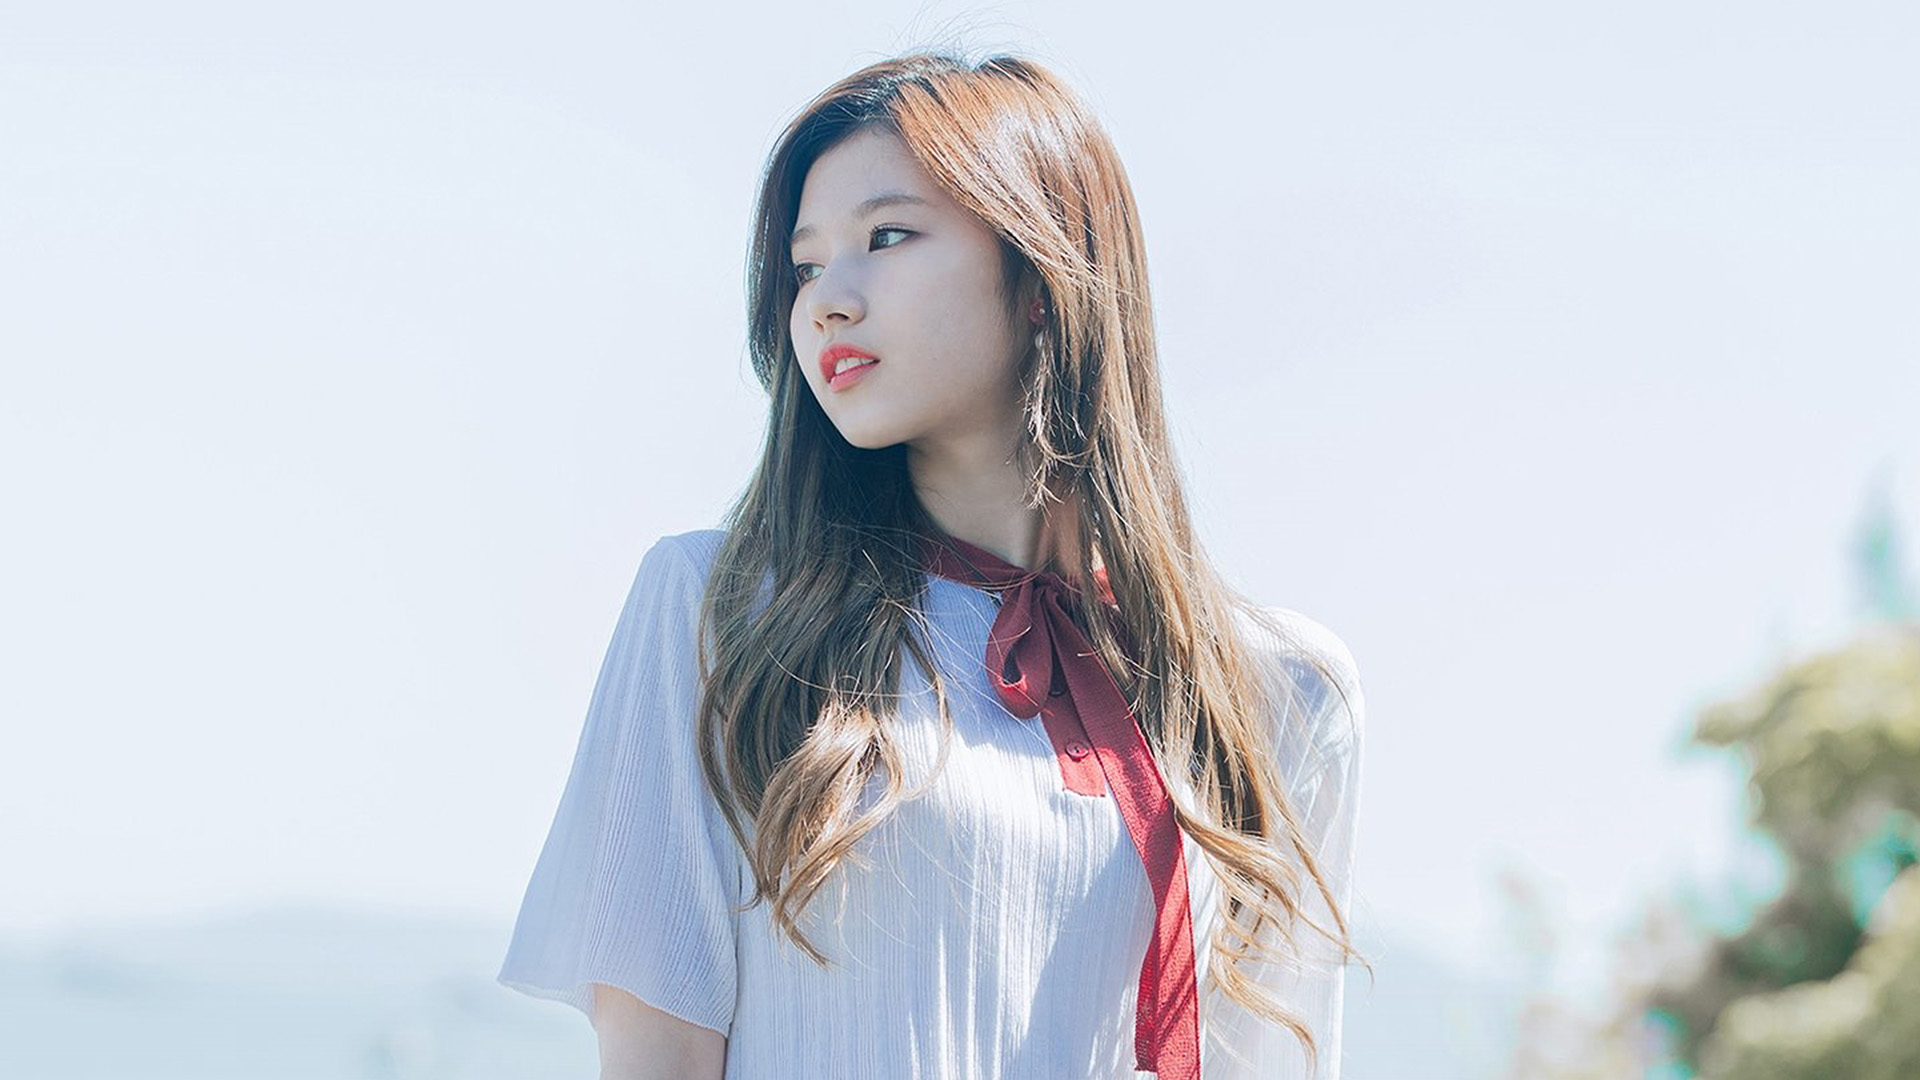 hn77-twice-sana-girl-cute-kpop-wallpaper